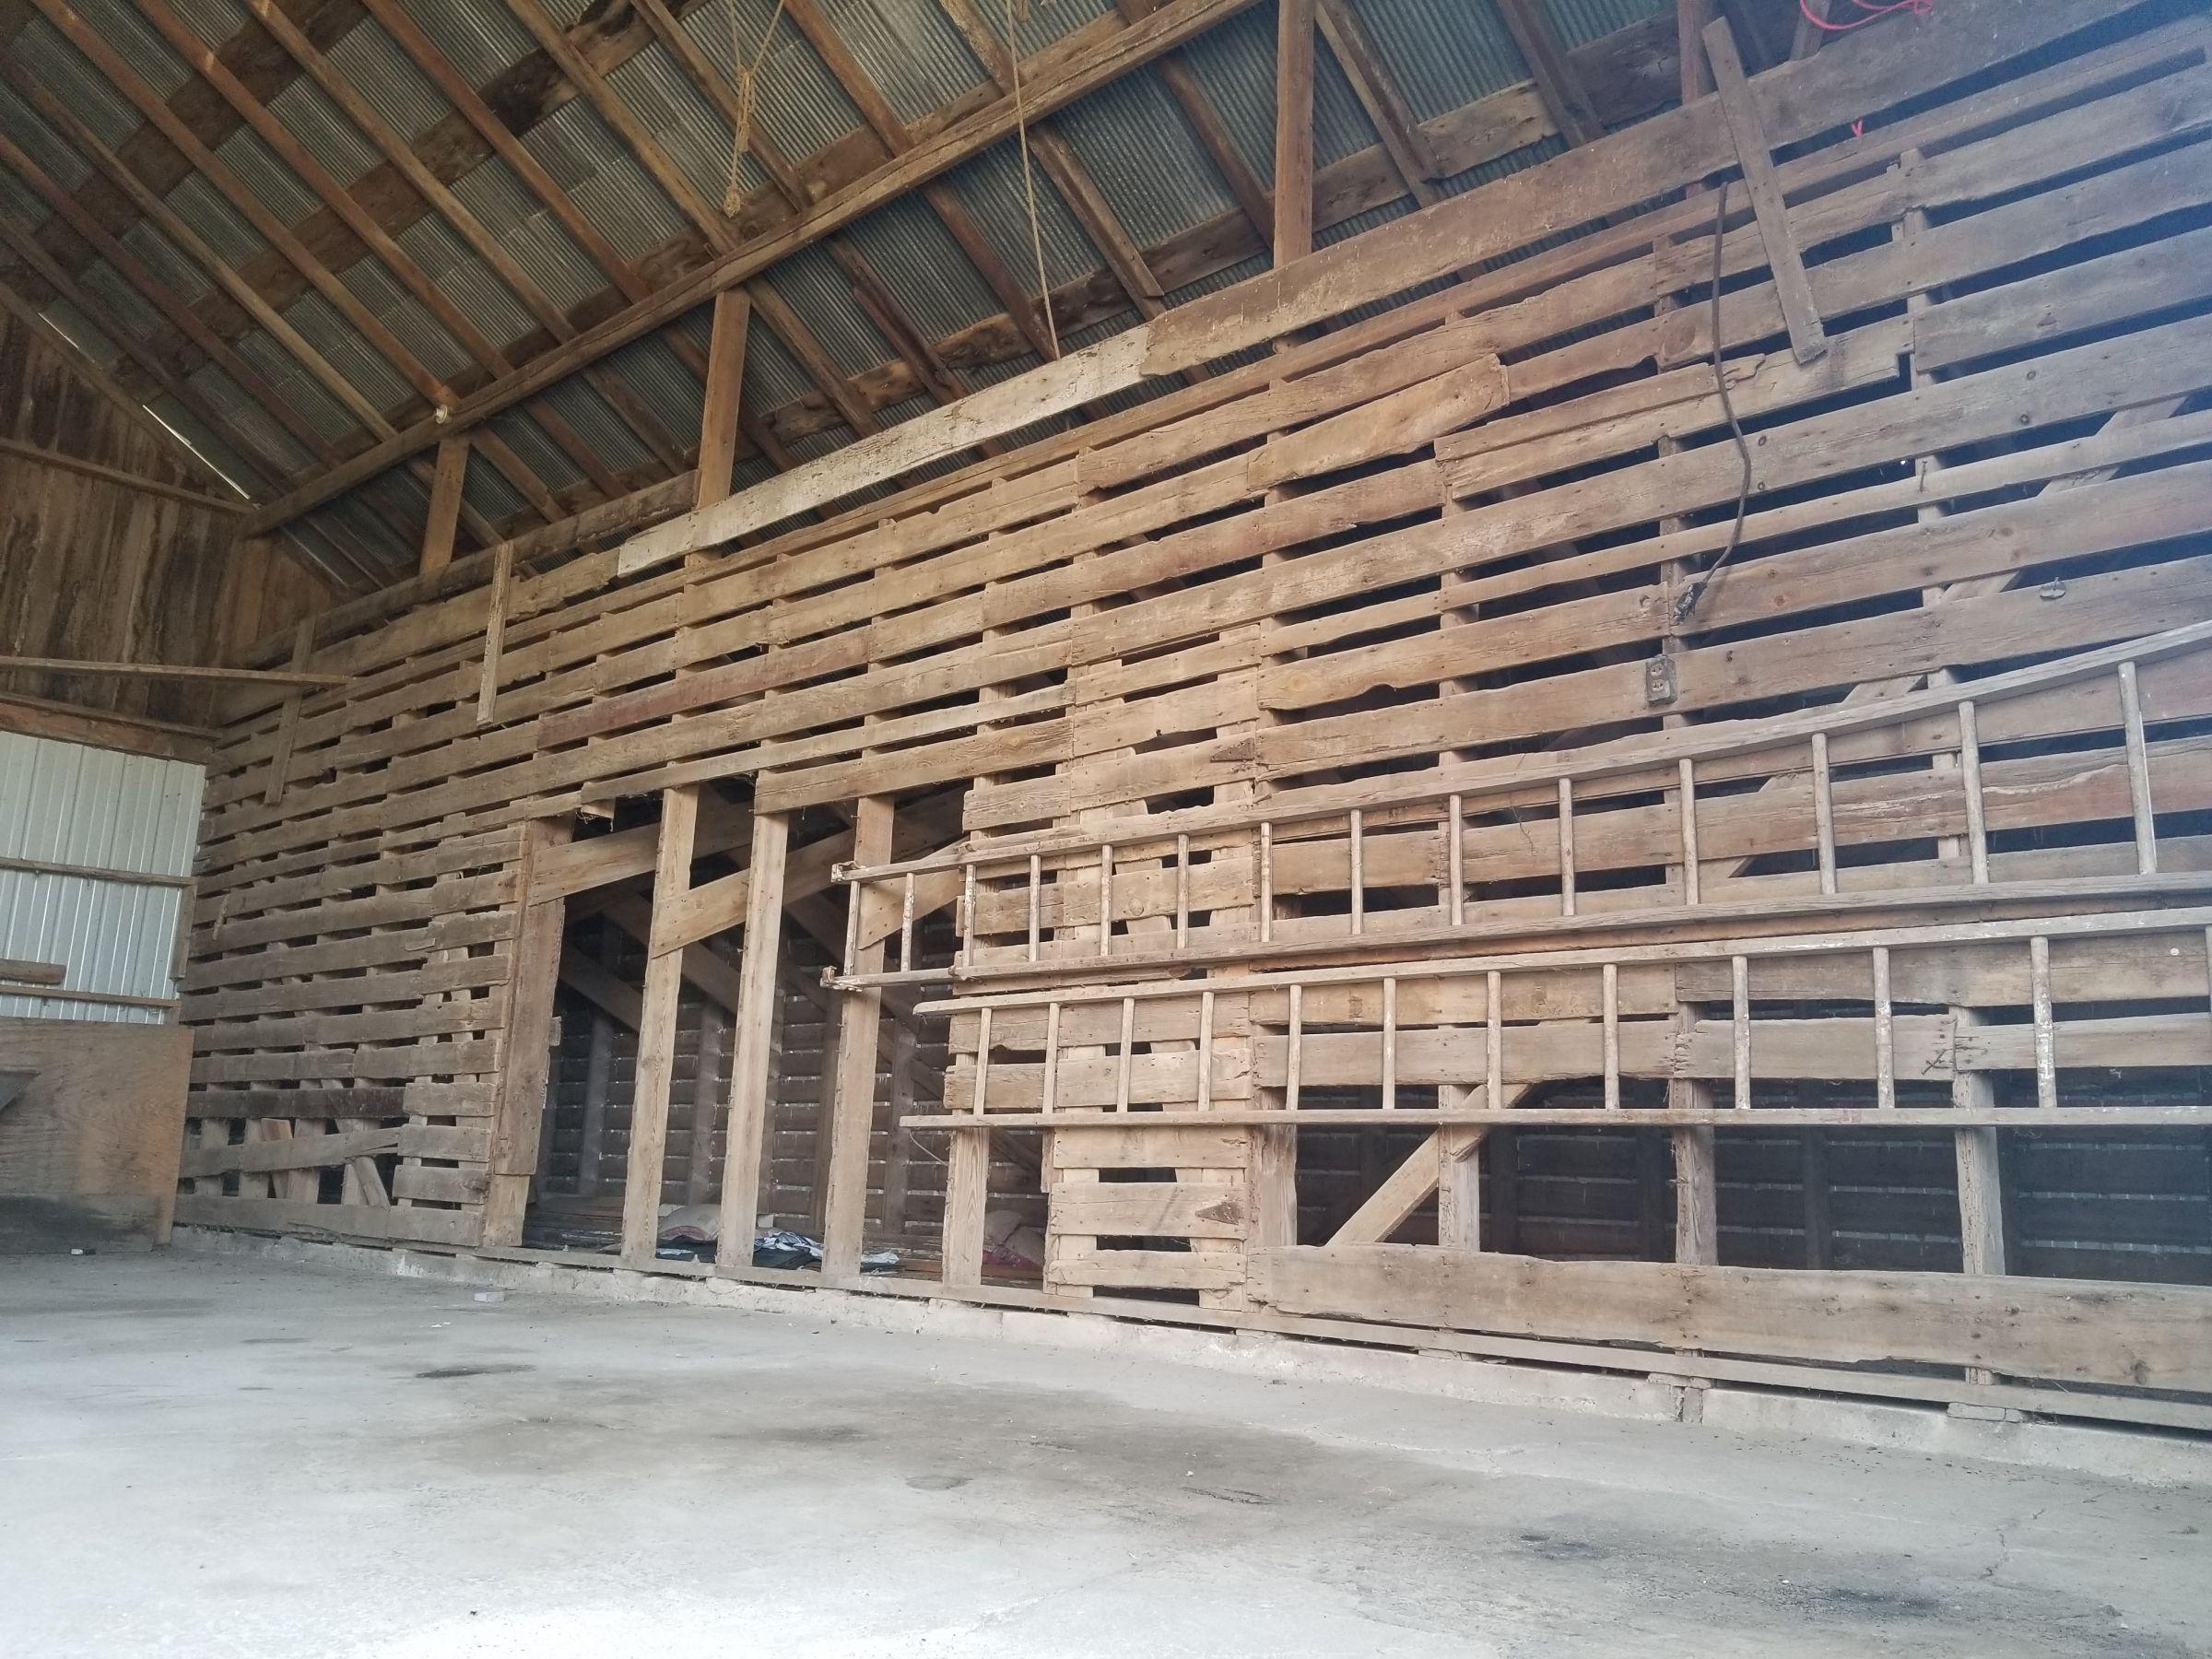 residential-land-poweshiek-county-iowa-5-acres-listing-number-15149-0-2020-08-28-203459.jpg